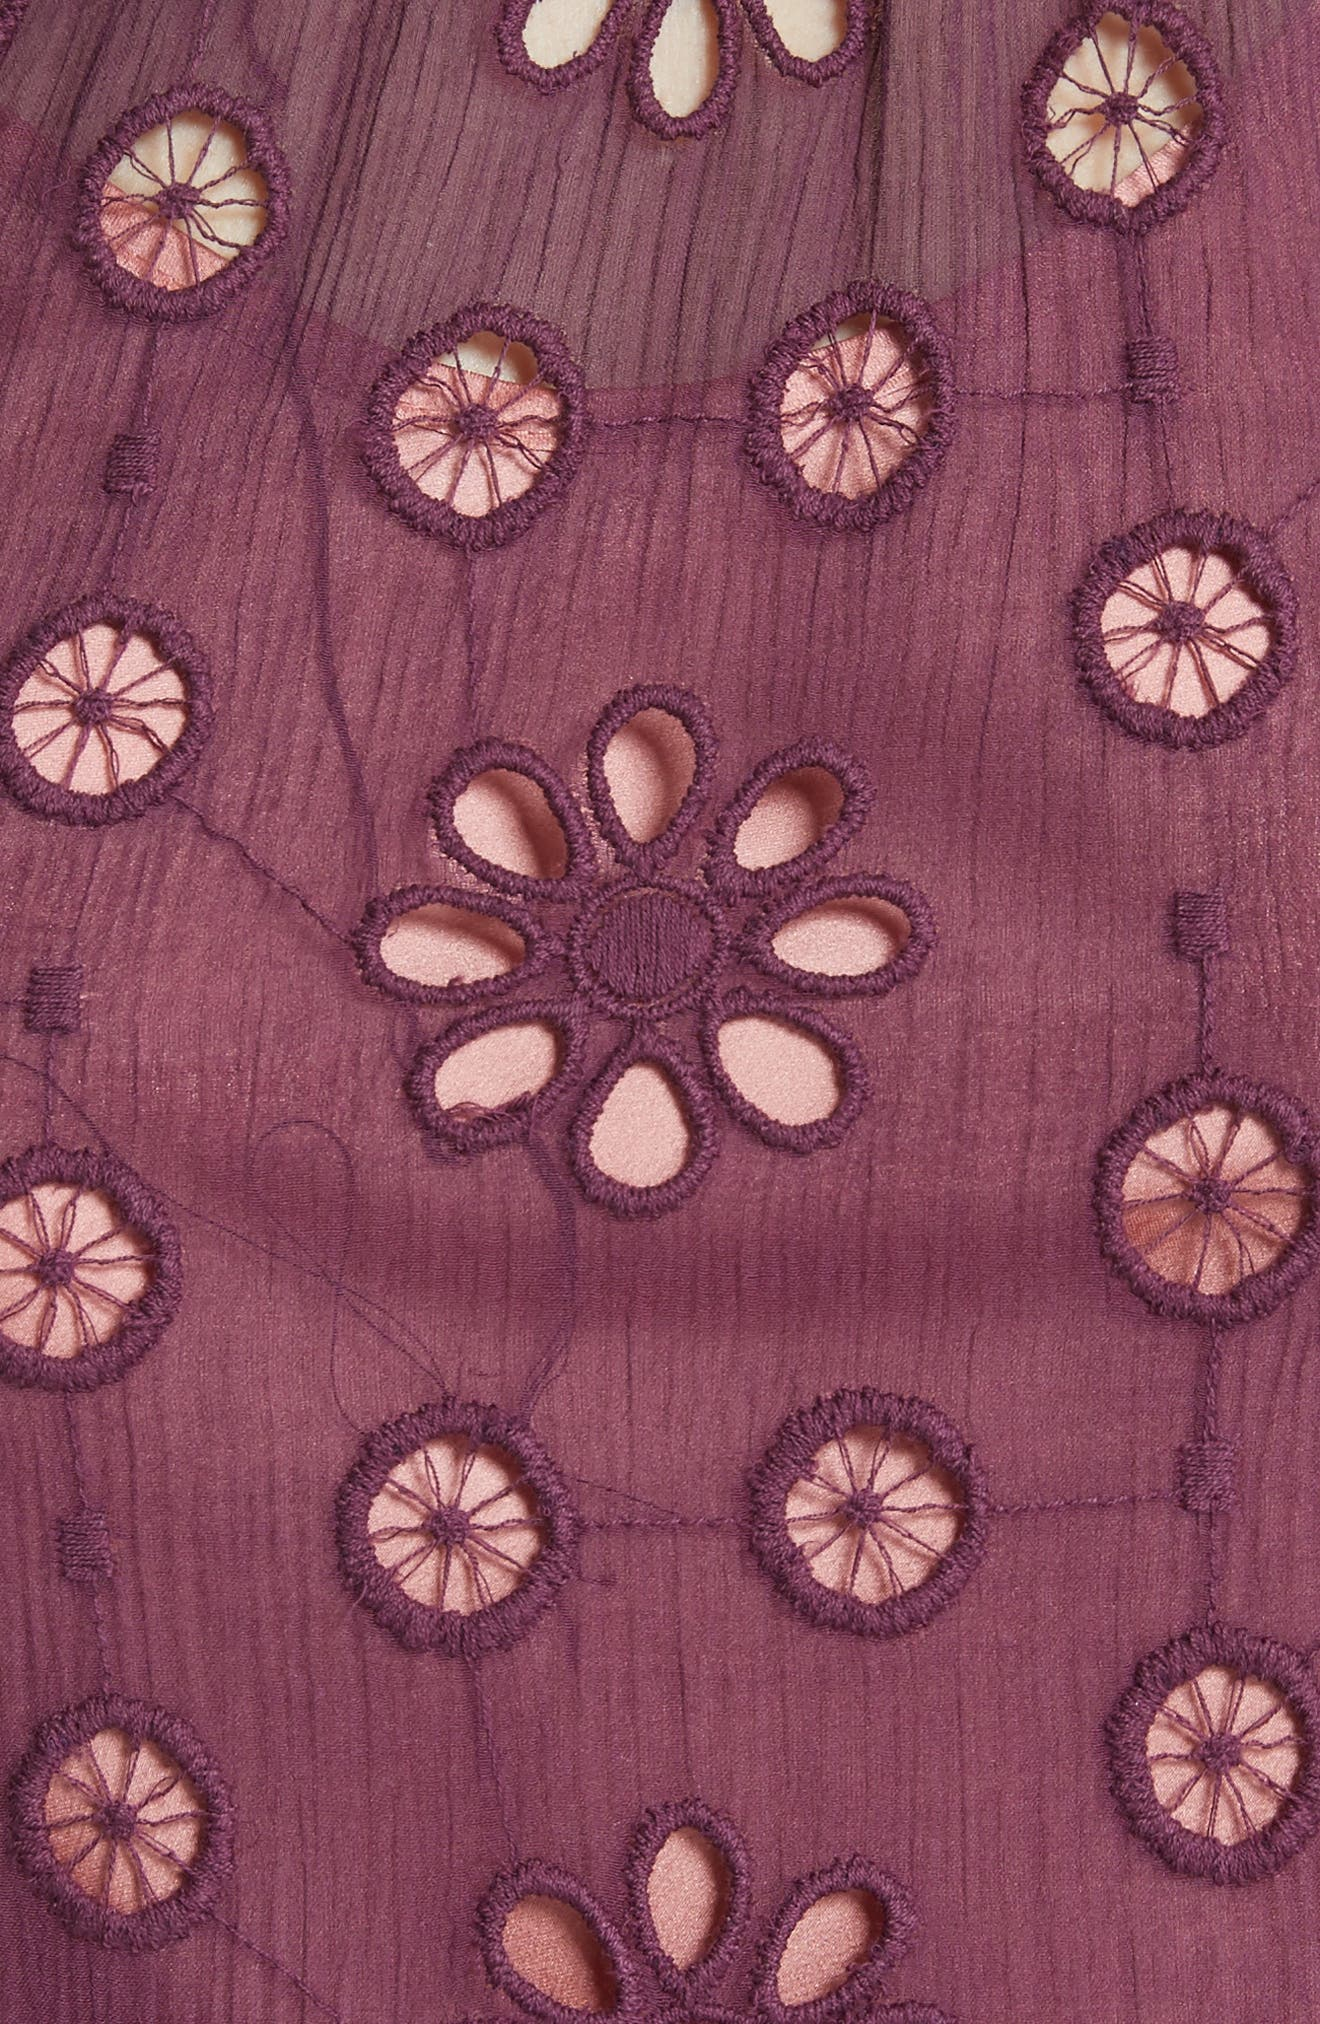 Pinwheel Eyelet Dress,                             Alternate thumbnail 5, color,                             Plum